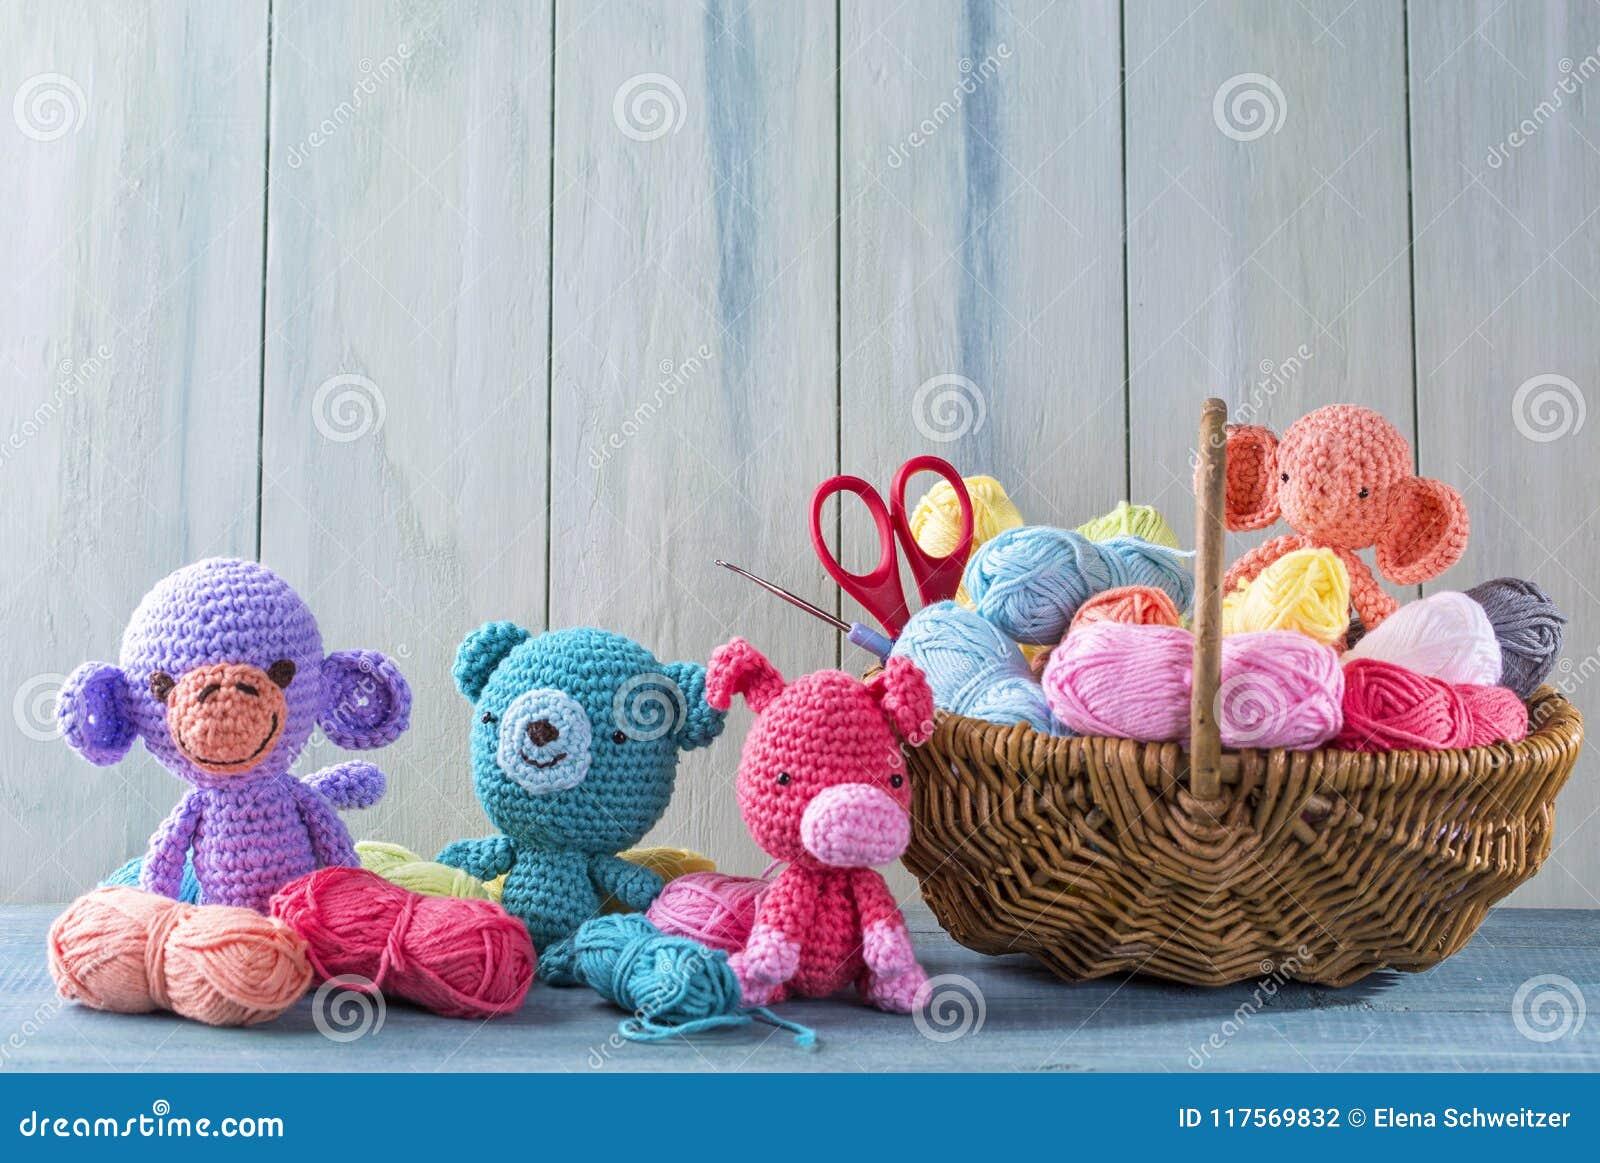 Lille, M: Lovable Amigurumi Toys (Lilleliis): Amazon.de: Lille ... | 962x1300